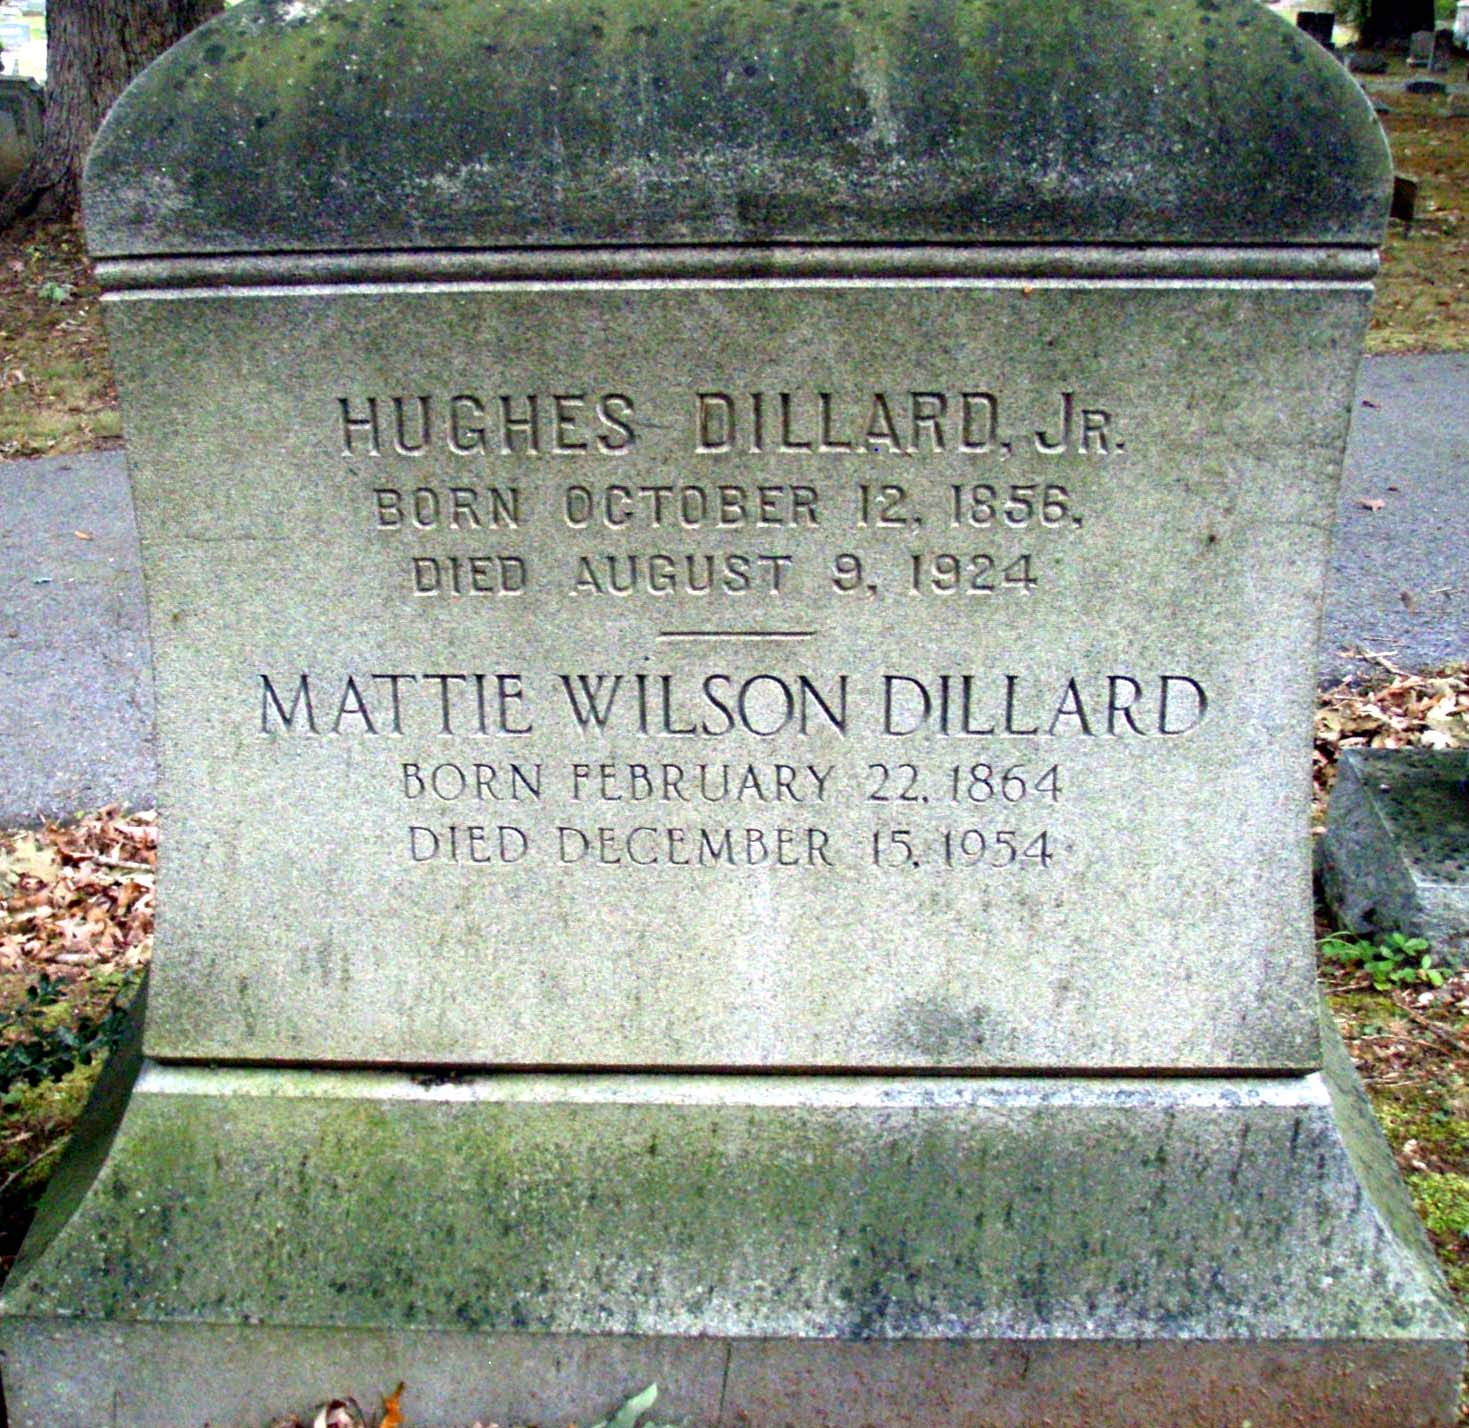 Hughes Dillard, Jr